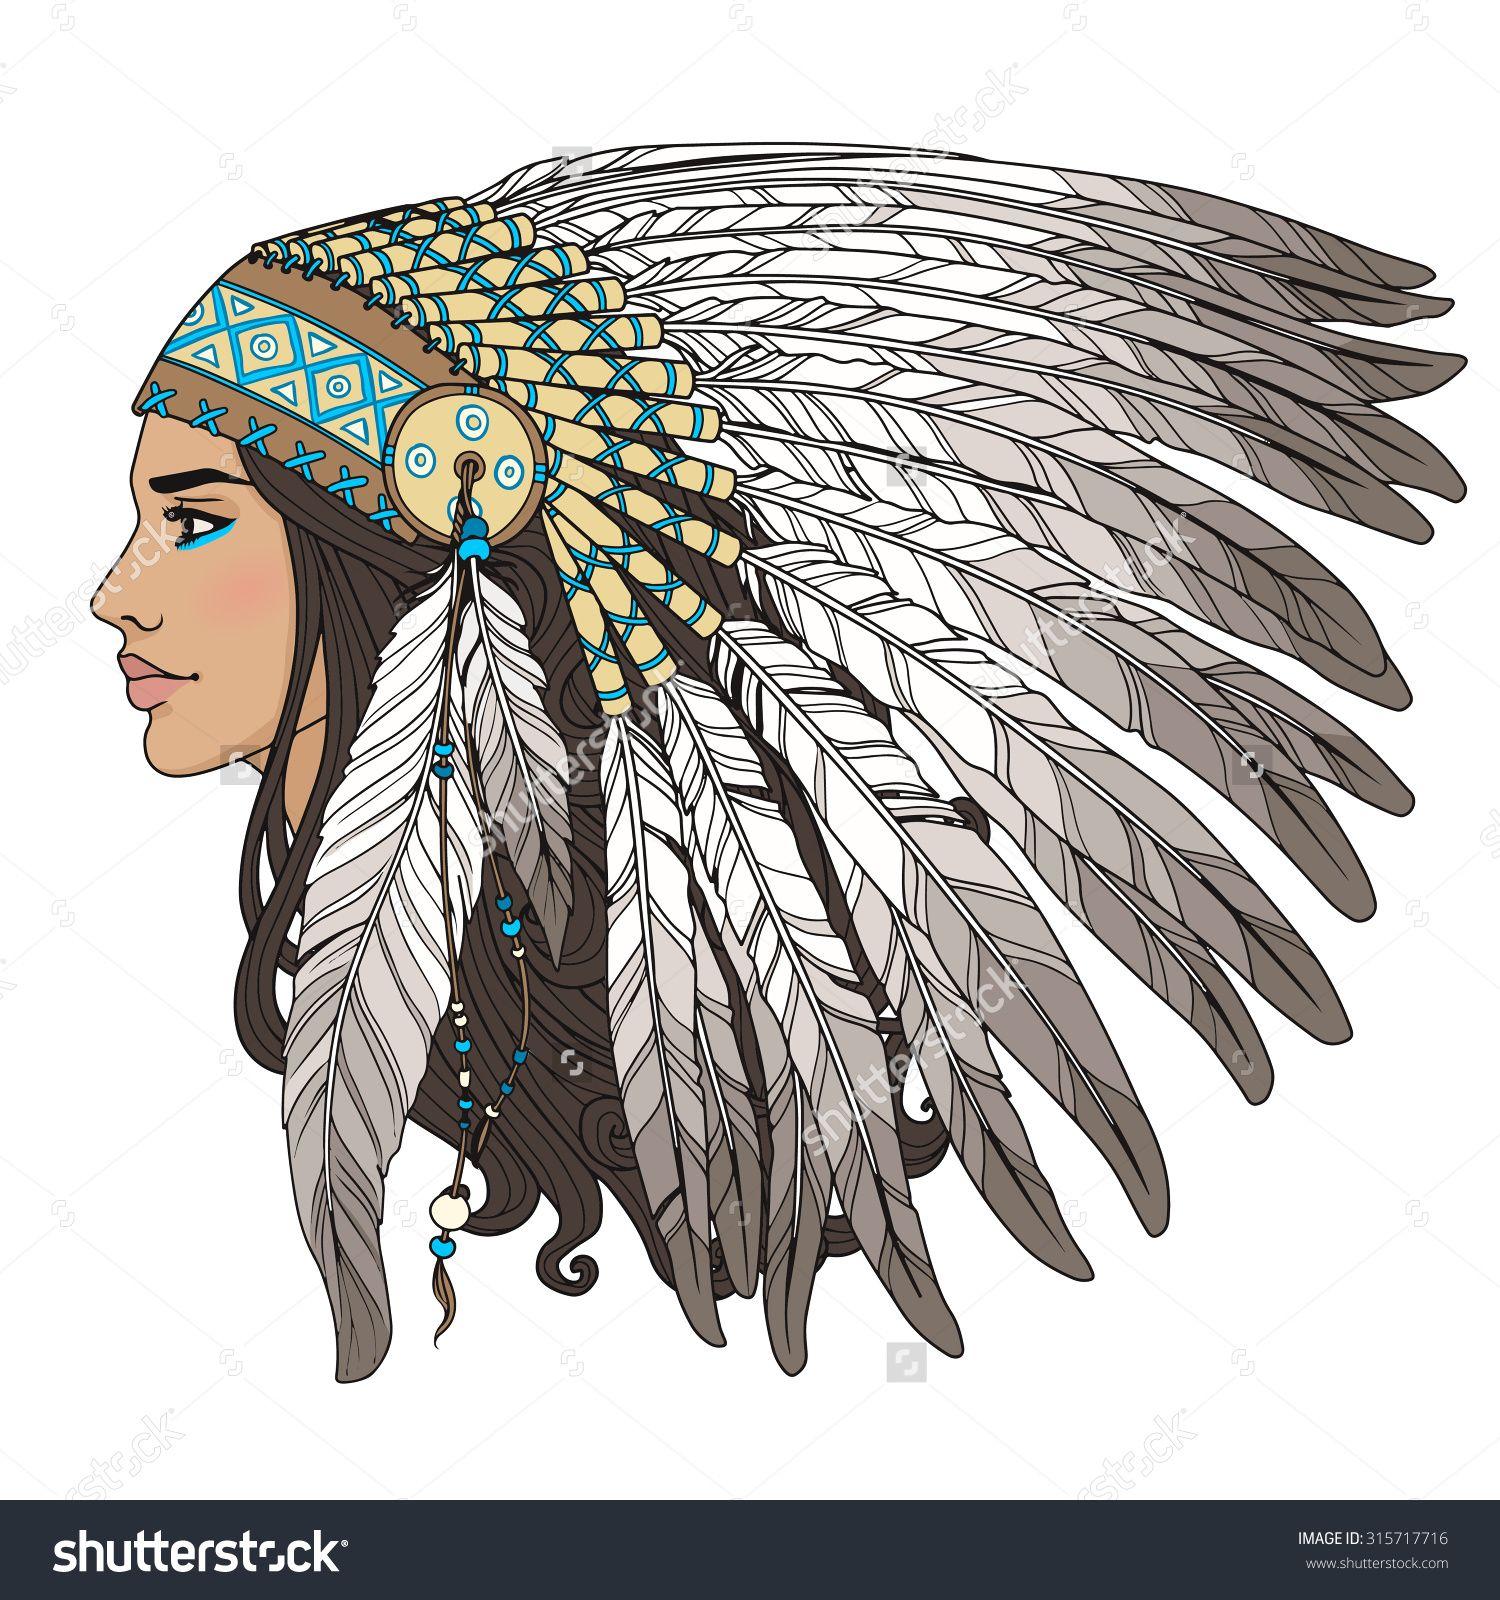 1500x1600 Nativedian Woman Drawing Ltbgtnative Americandian Girlltgt